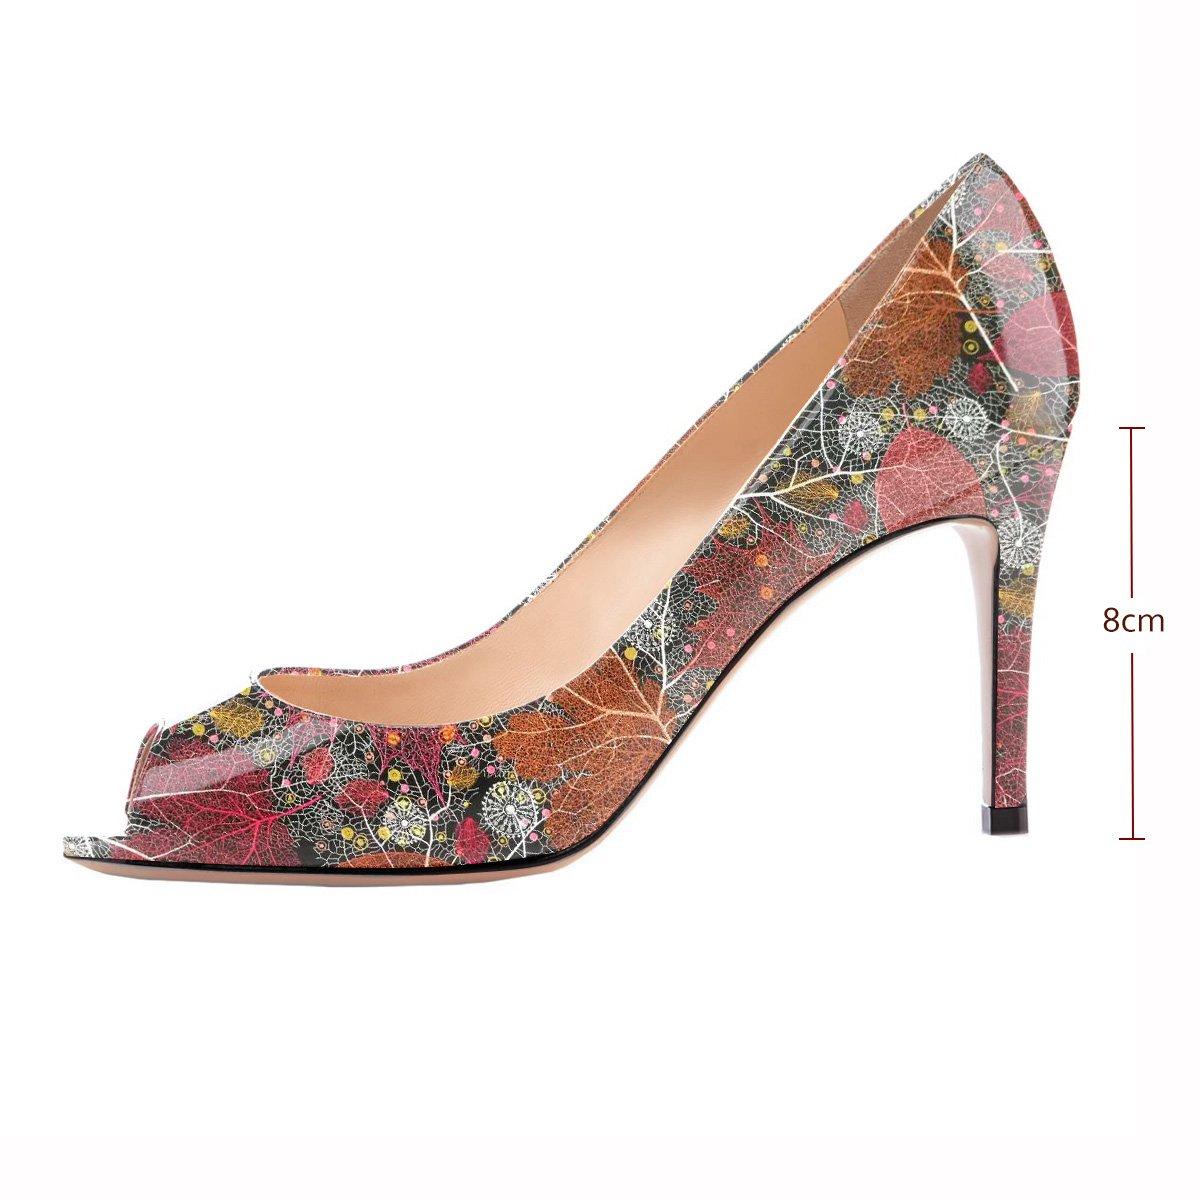 Eldof Women Peep Toe Pumps Mid-Heel Pumps Heel Formal Wedding Bridal Classic Heel Pumps Open Toe Stiletto B07F3Z2R8F 6 B(M) US|Red-leaf 090794